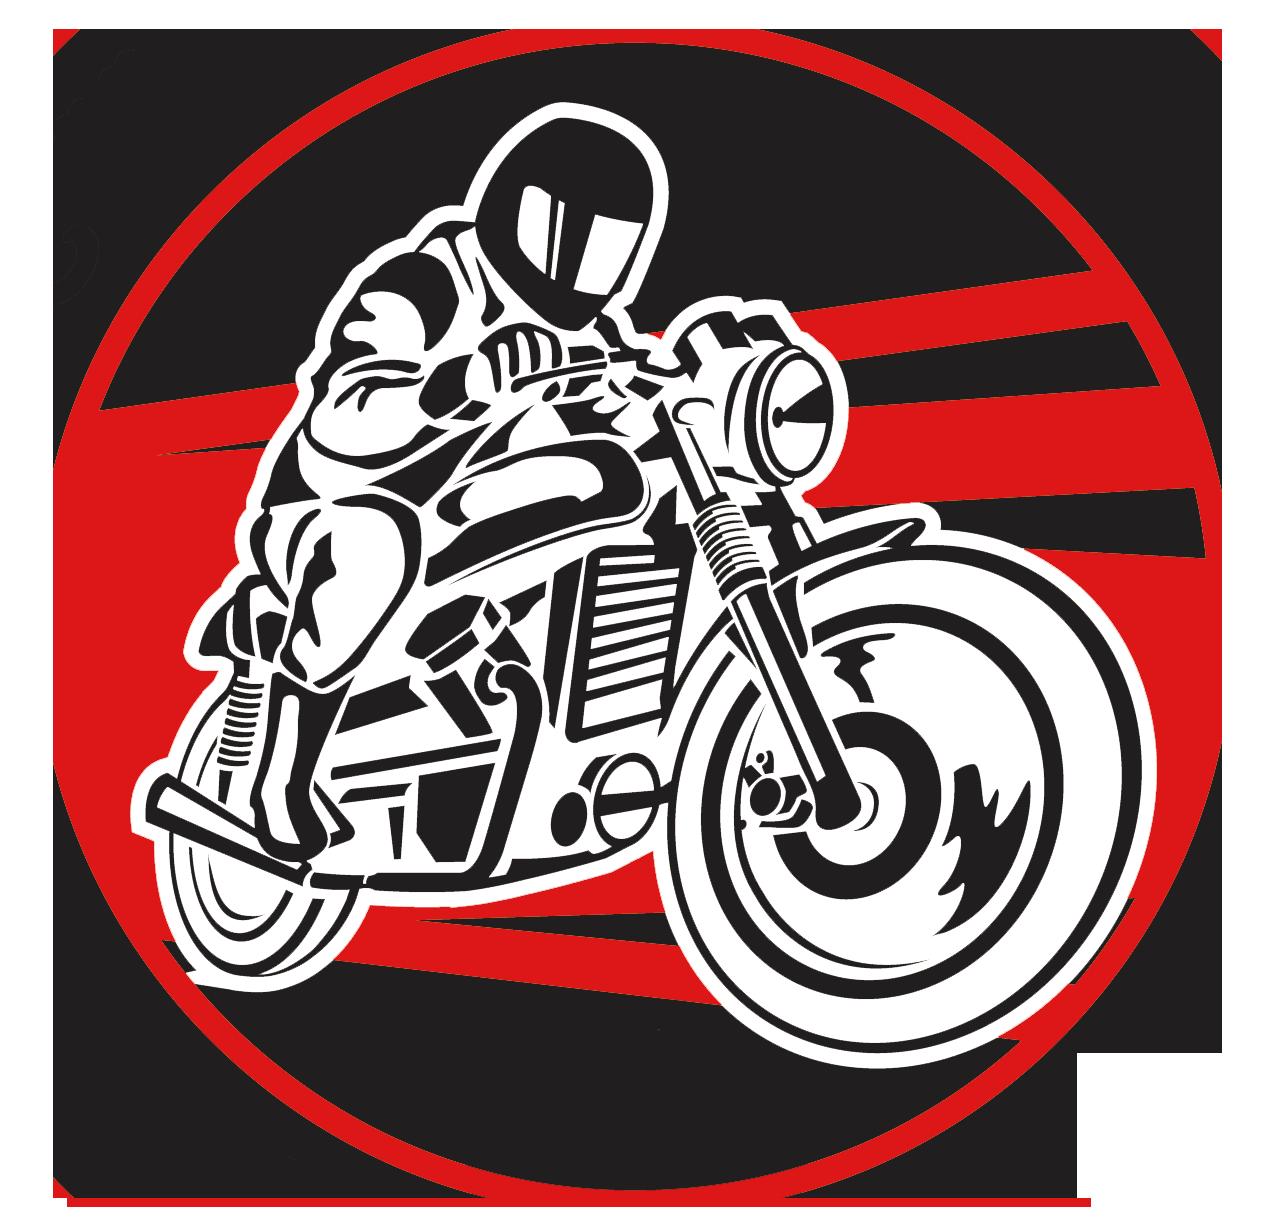 Motorcycle License | Indiana | M Y Motorsports | (812) 778-0039